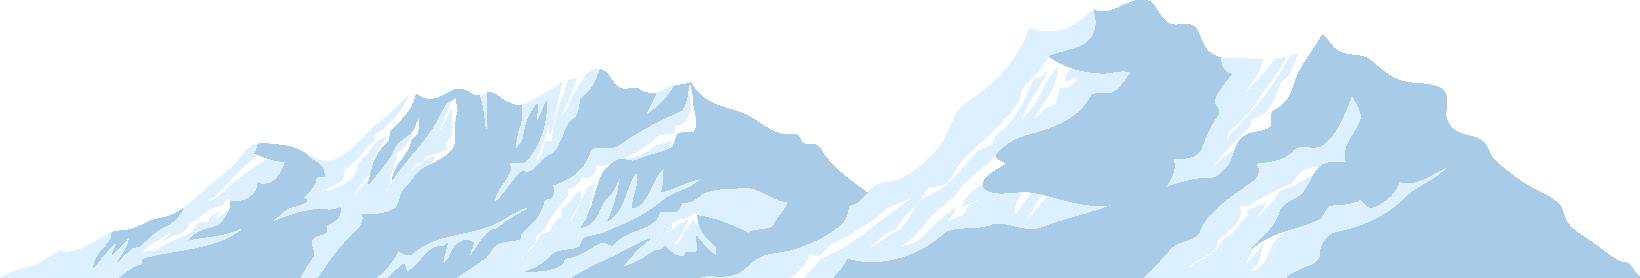 River clip art free. Clipart snow scenery